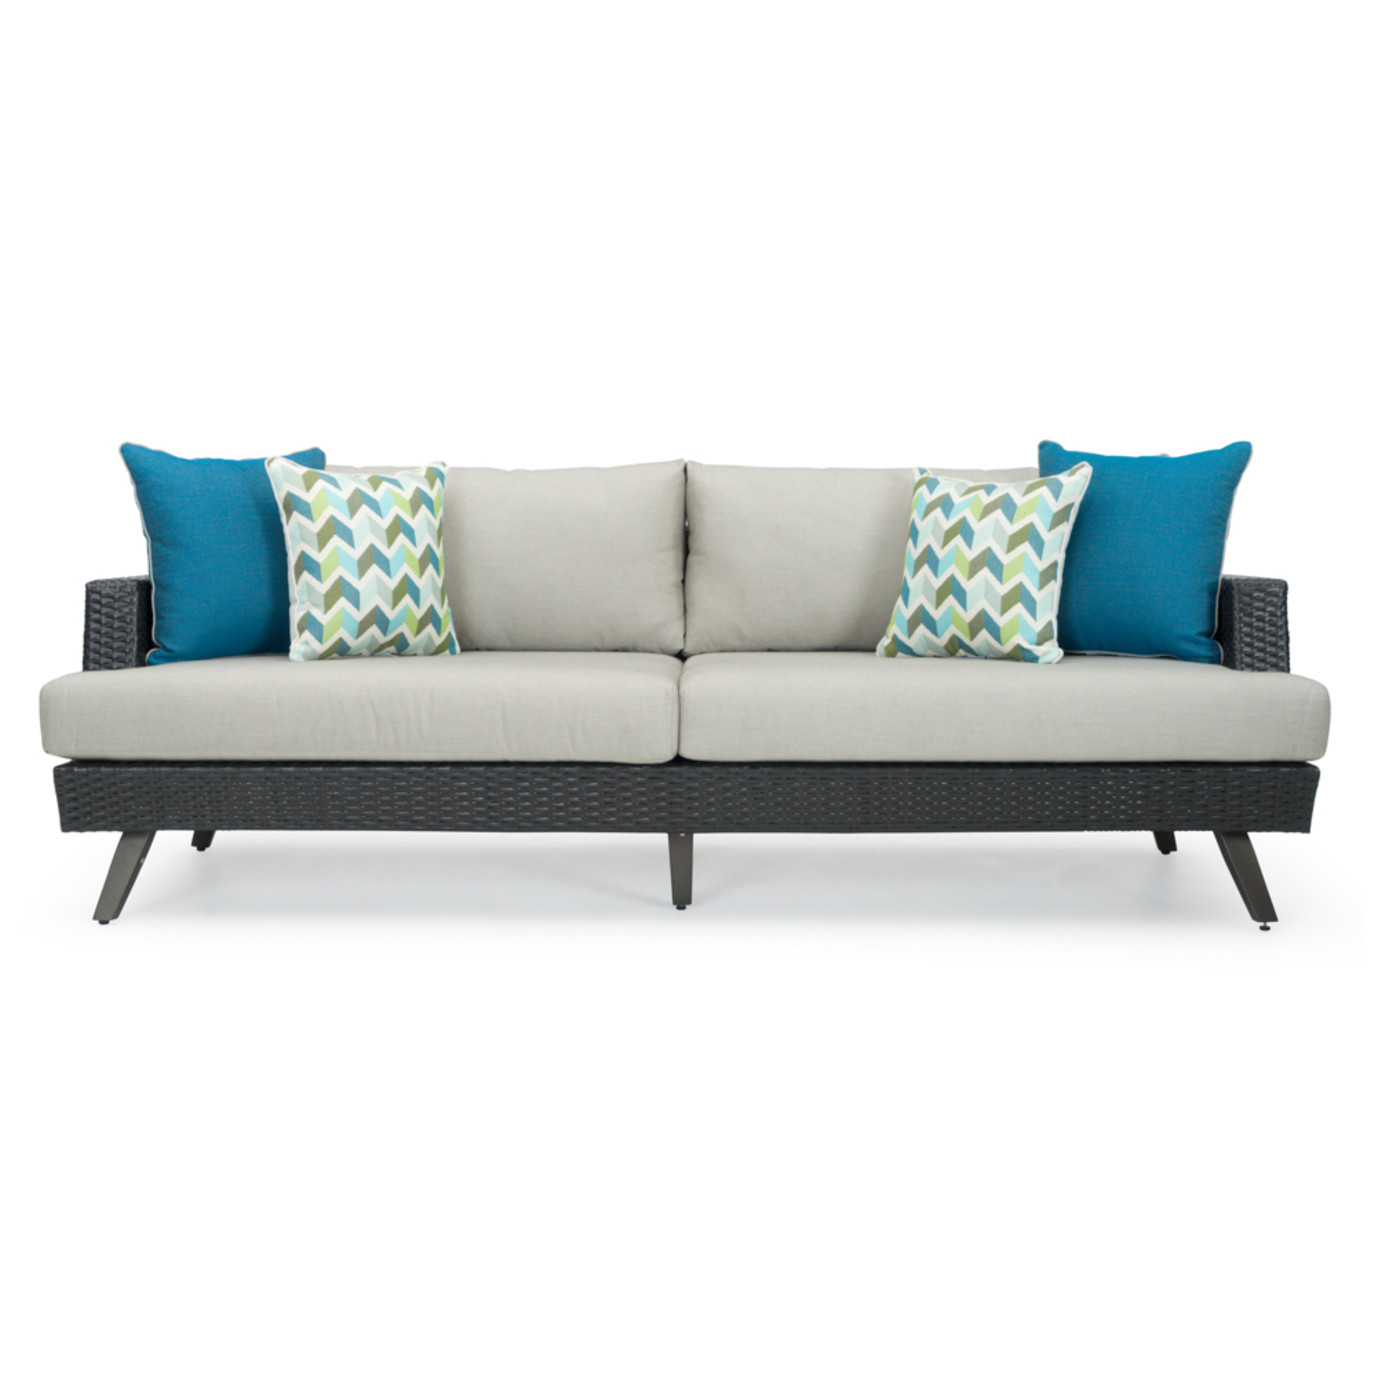 Portofino® Casual 7 Piece Motion Seating Set - Dove Gray